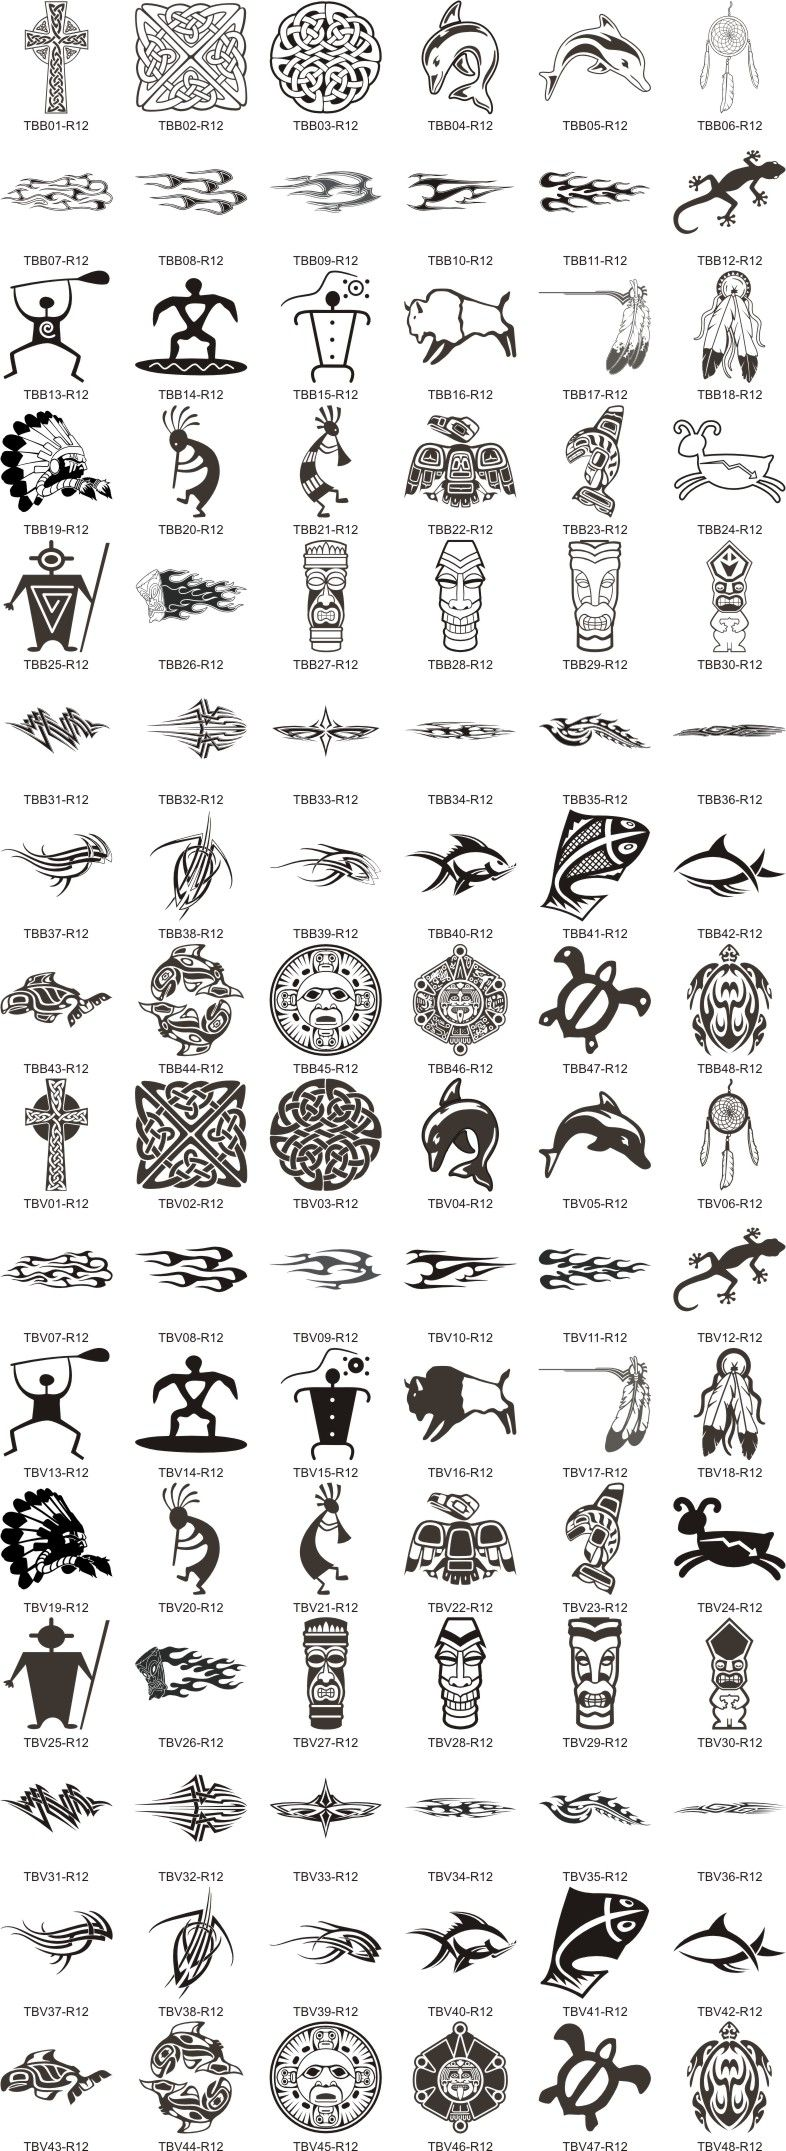 Become A Famous Fashion Designer Zentangle And Symbols Pinterest